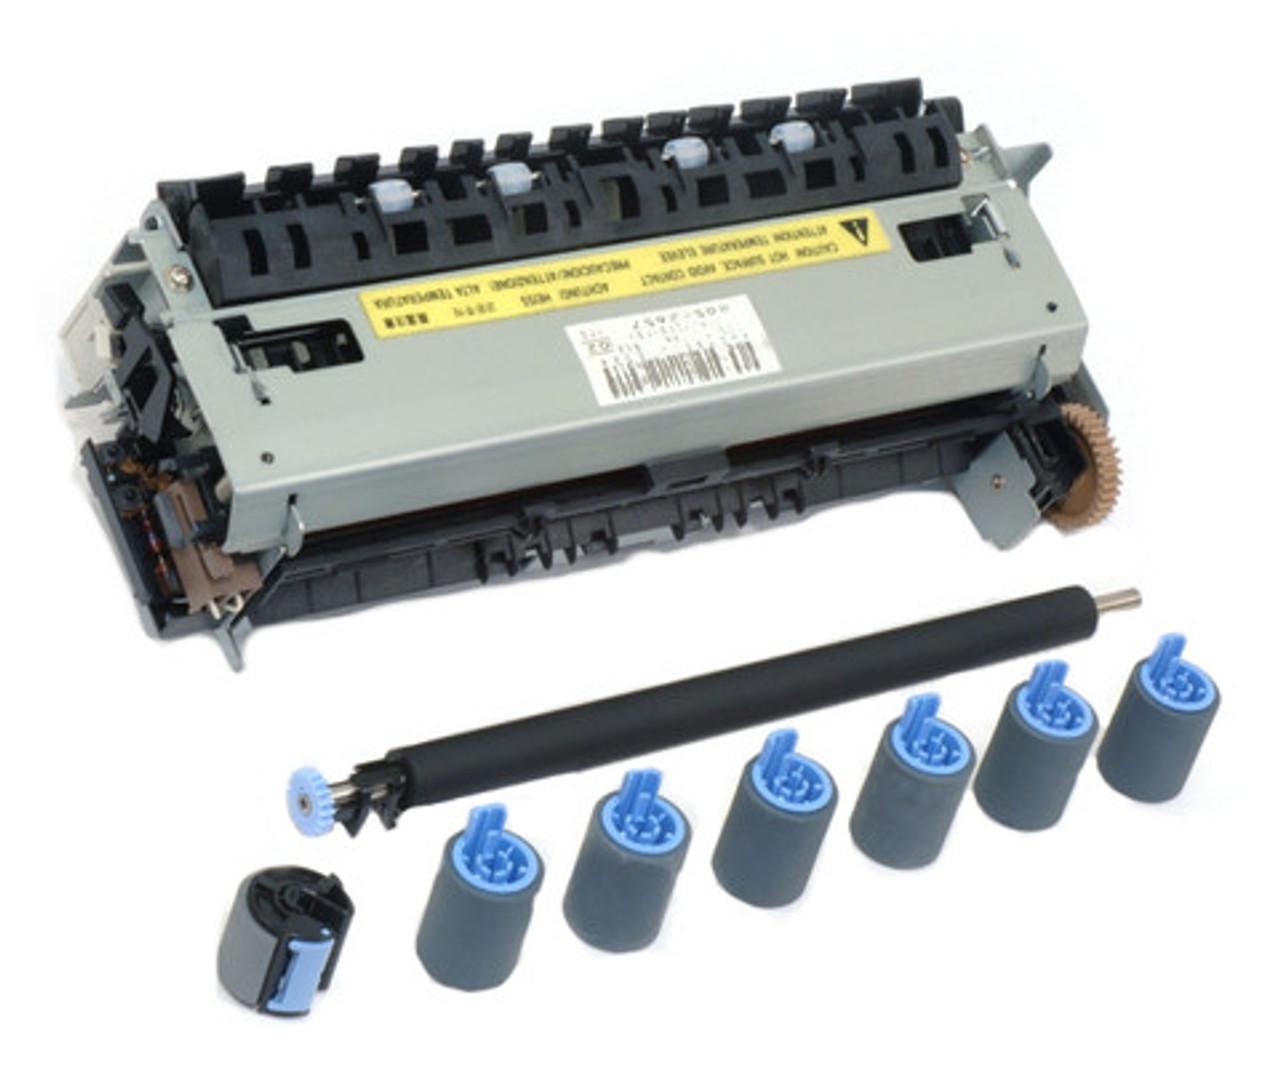 HP Laserjet 4000 Maintenance kit